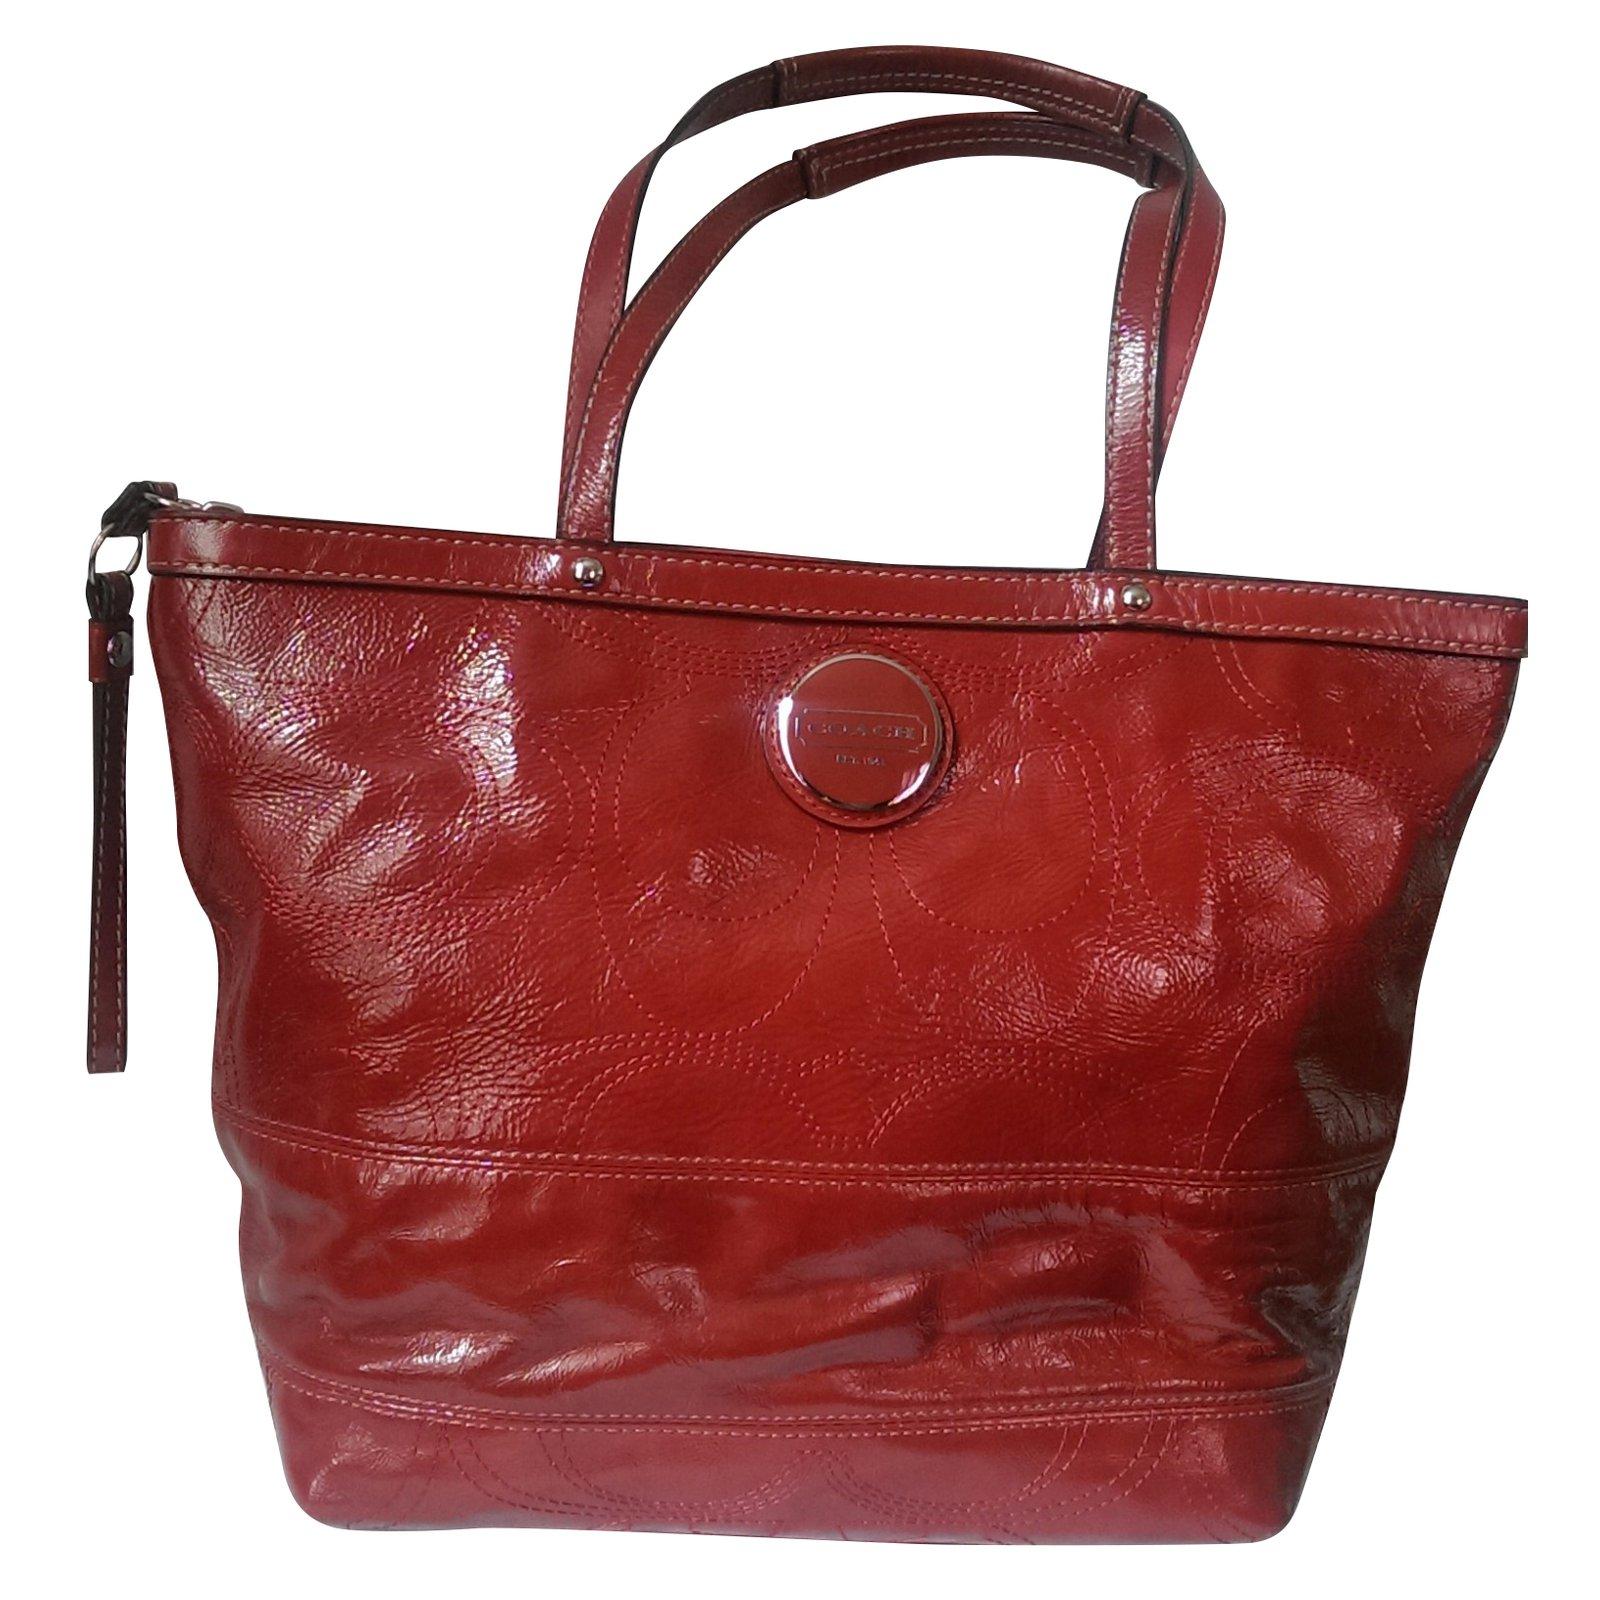 c25d9c626 Coach Handbag Handbags Patent leather Red ref.40353 - Joli Closet